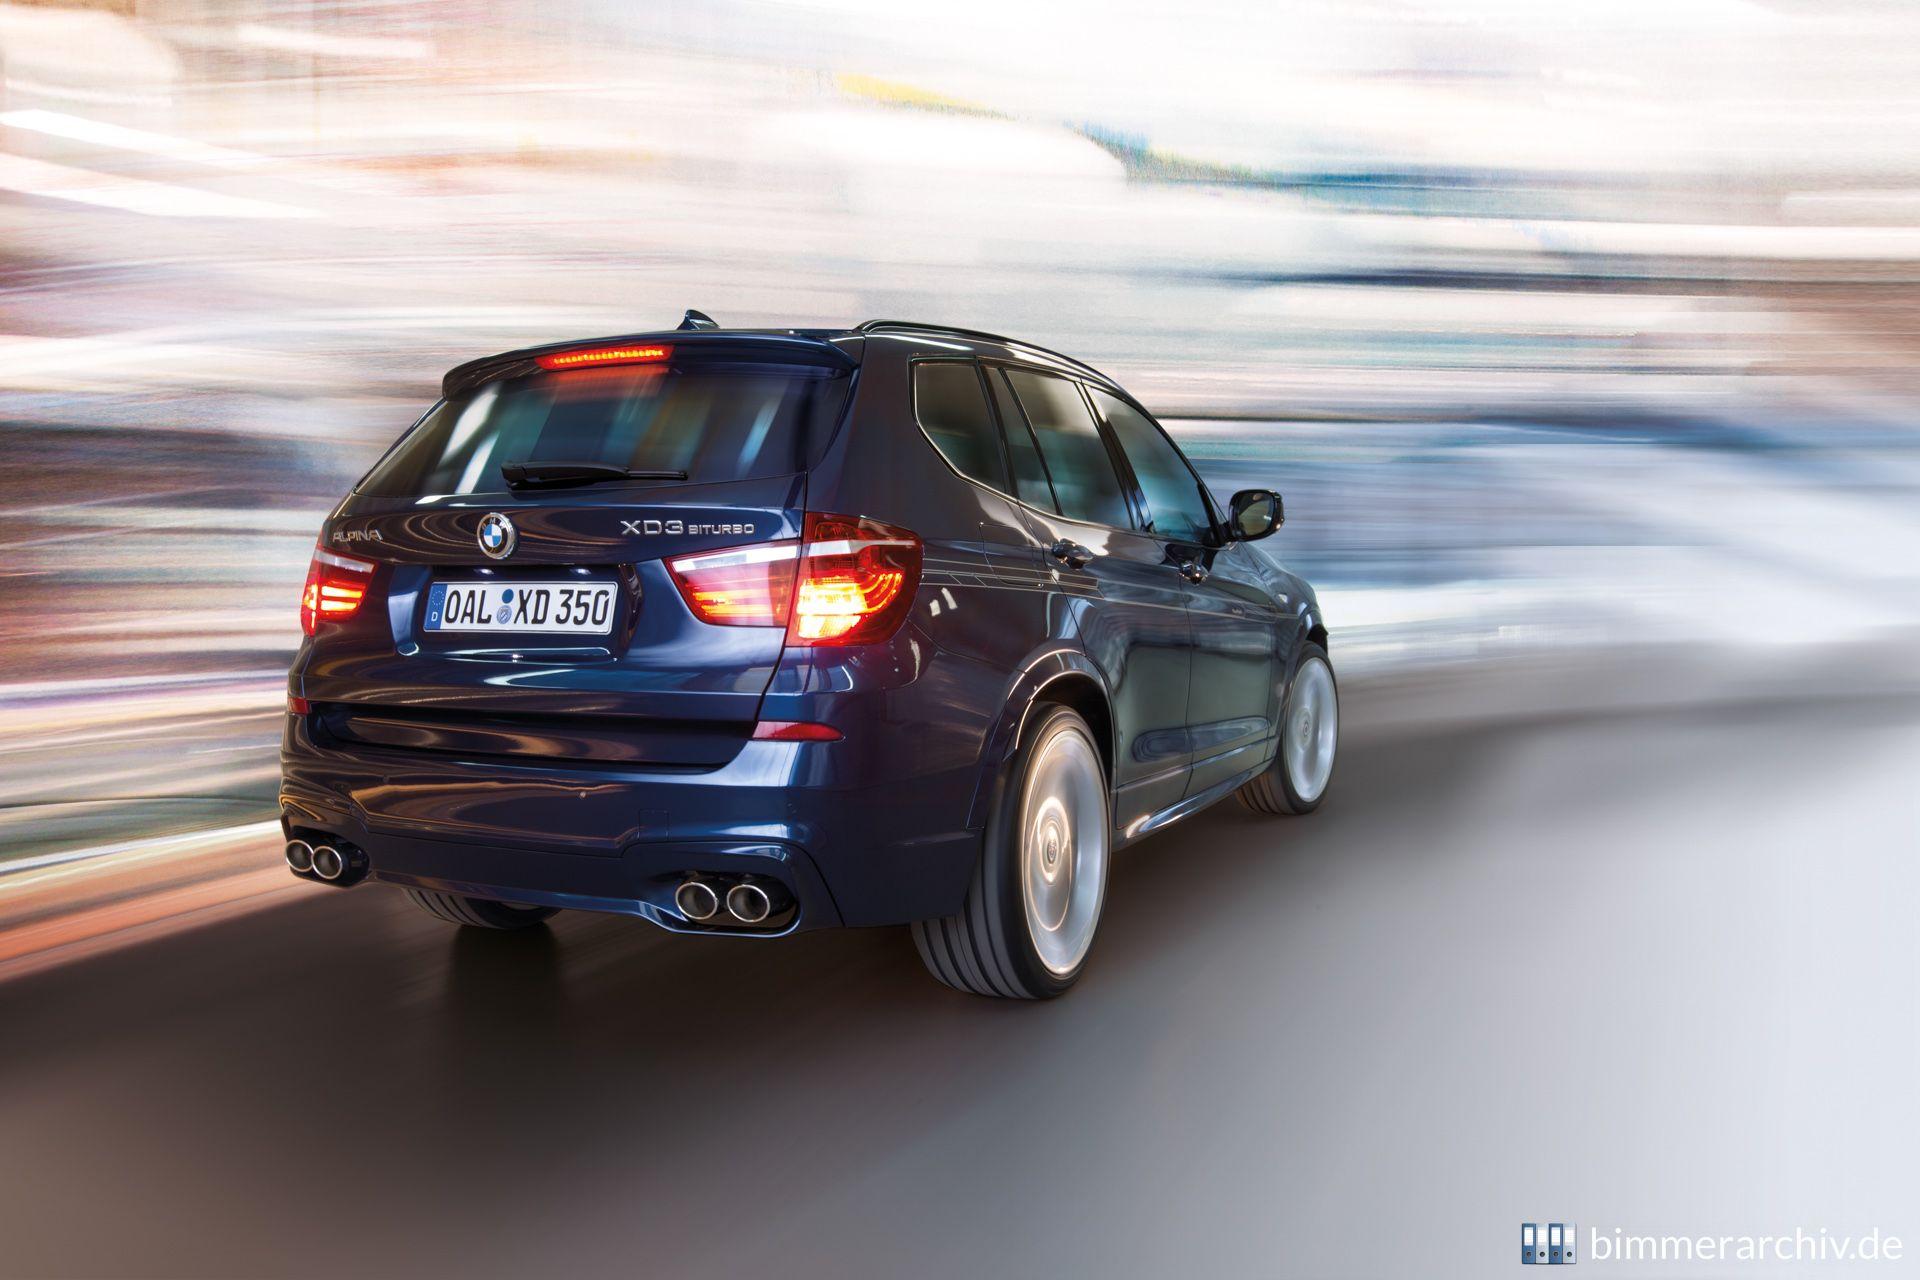 Model Archive for BMW models · BMW Alpina XD3 BiTurbo · bmwarchive.org